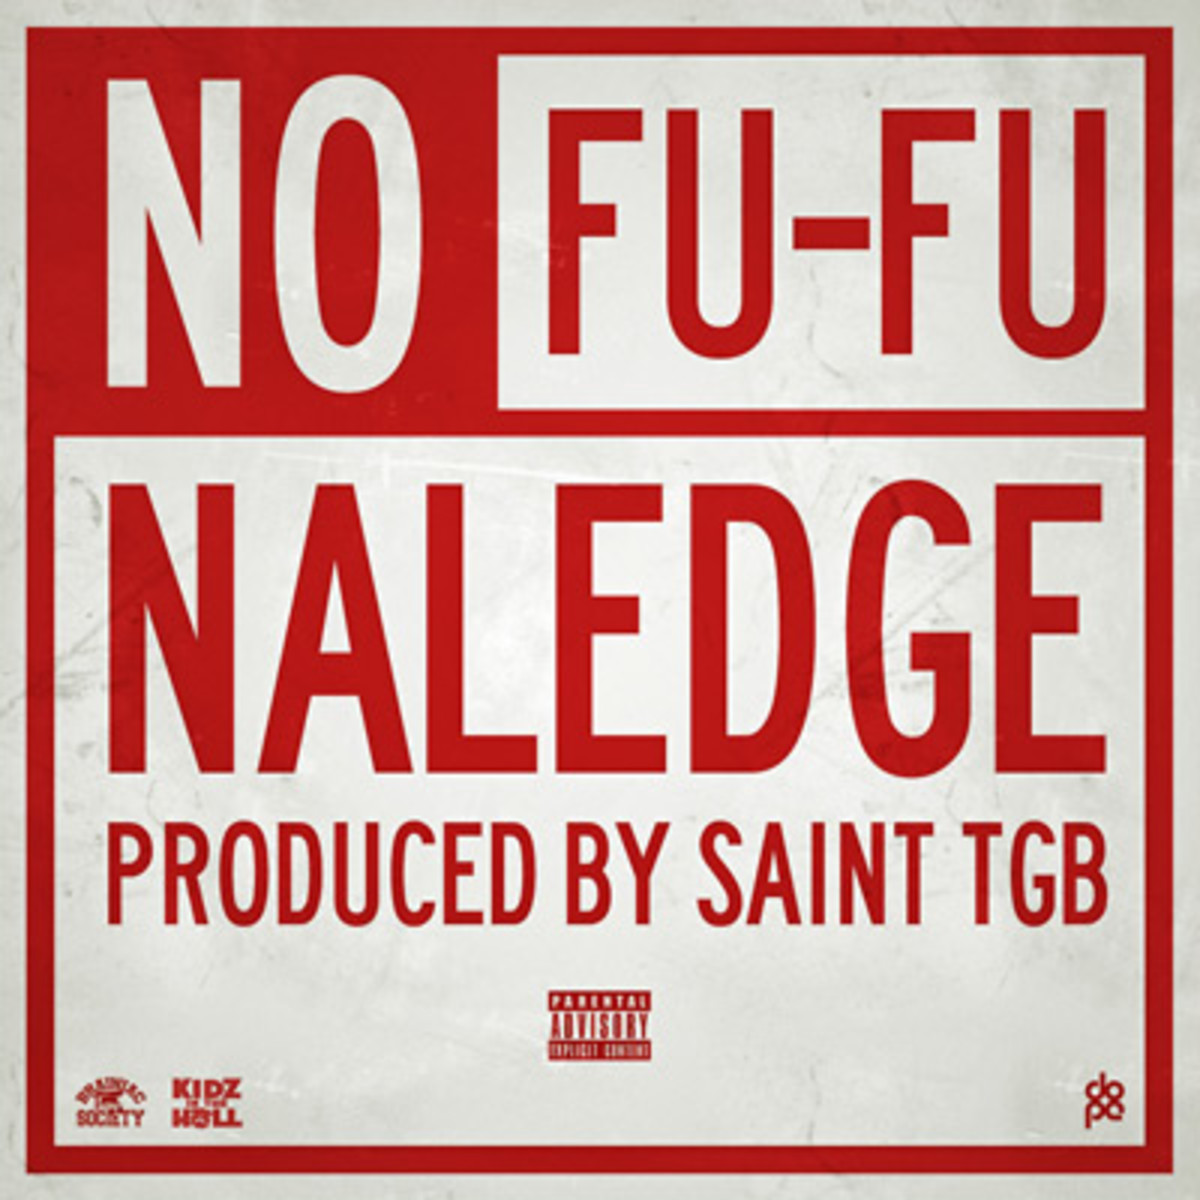 naledge-nofufu.jpg